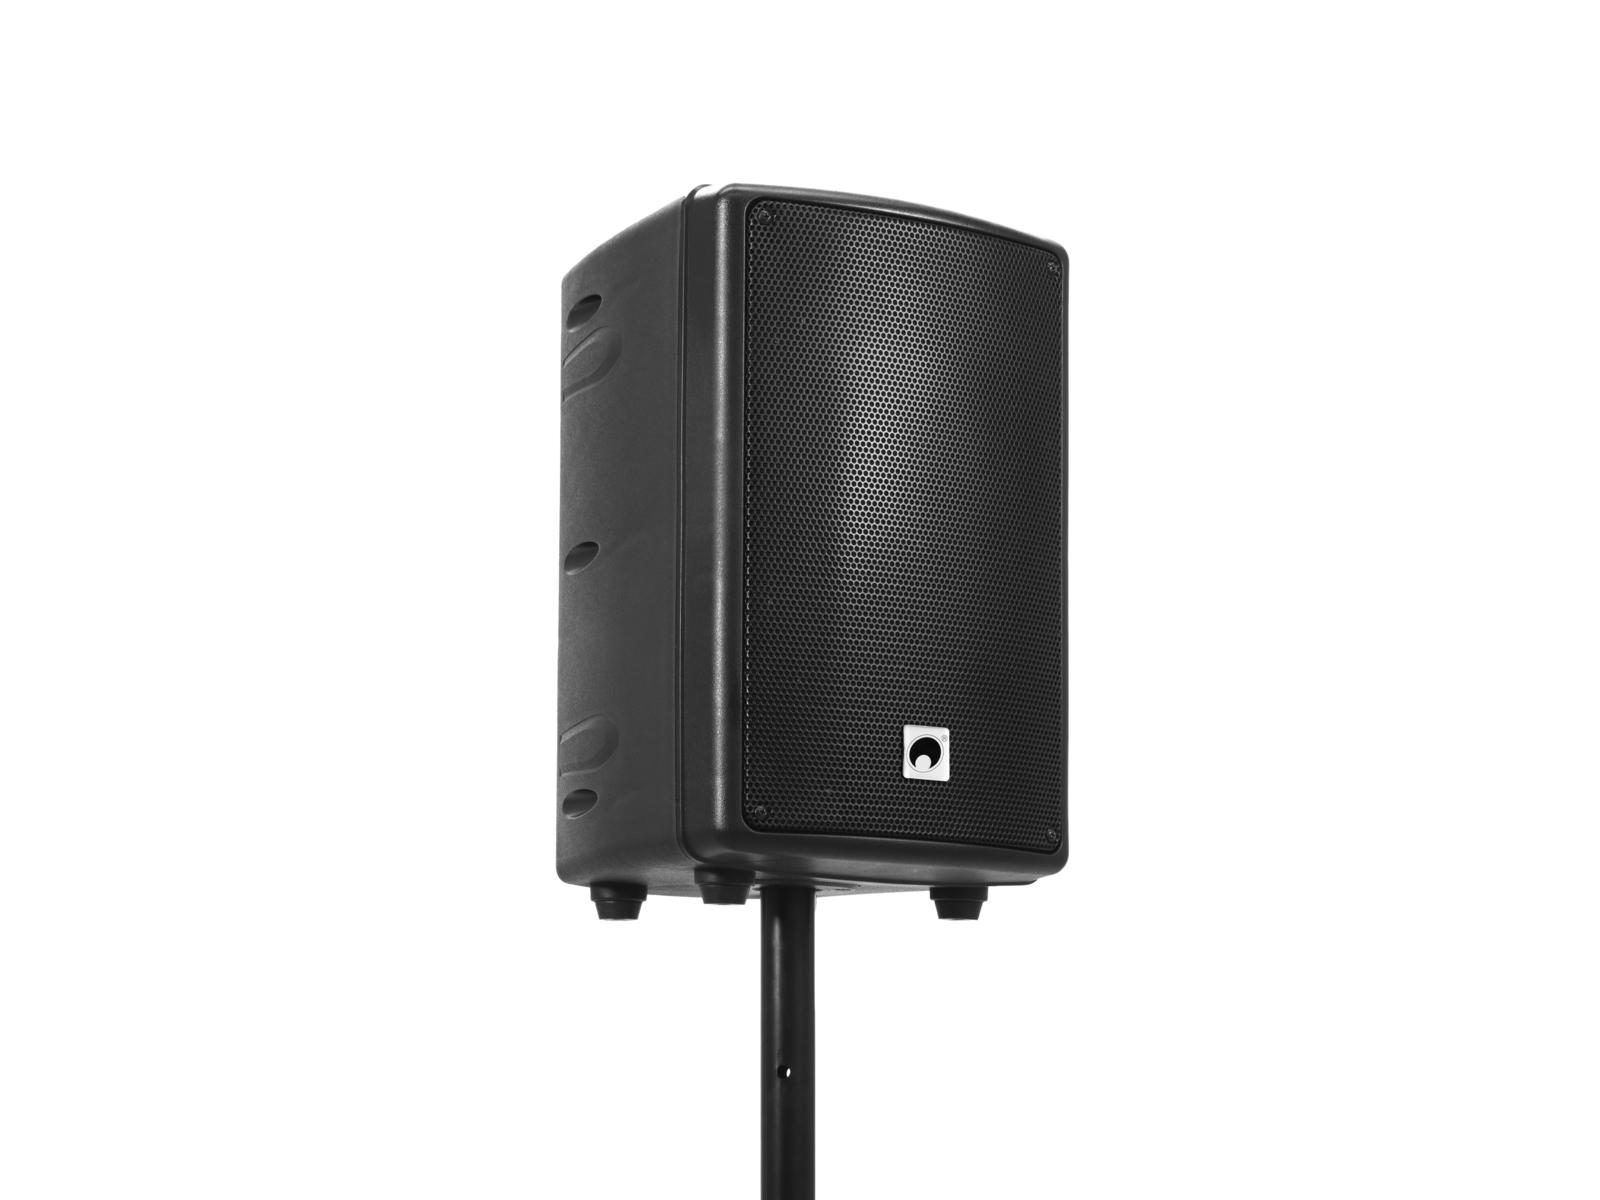 OMNITRONIC WAMS-08BT MK2 Drahtlos-PA-System